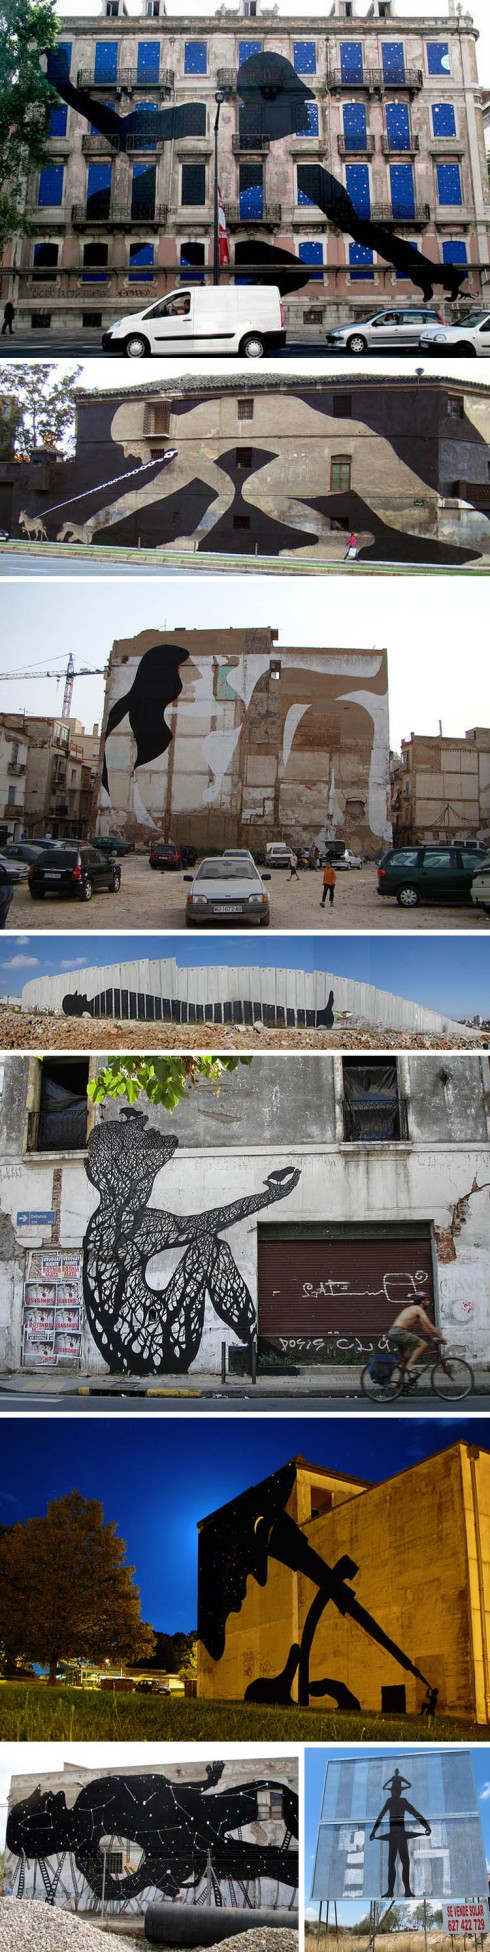 Spanish street art, graffiti, large murals, silhouettes, Sam3, collabcubed